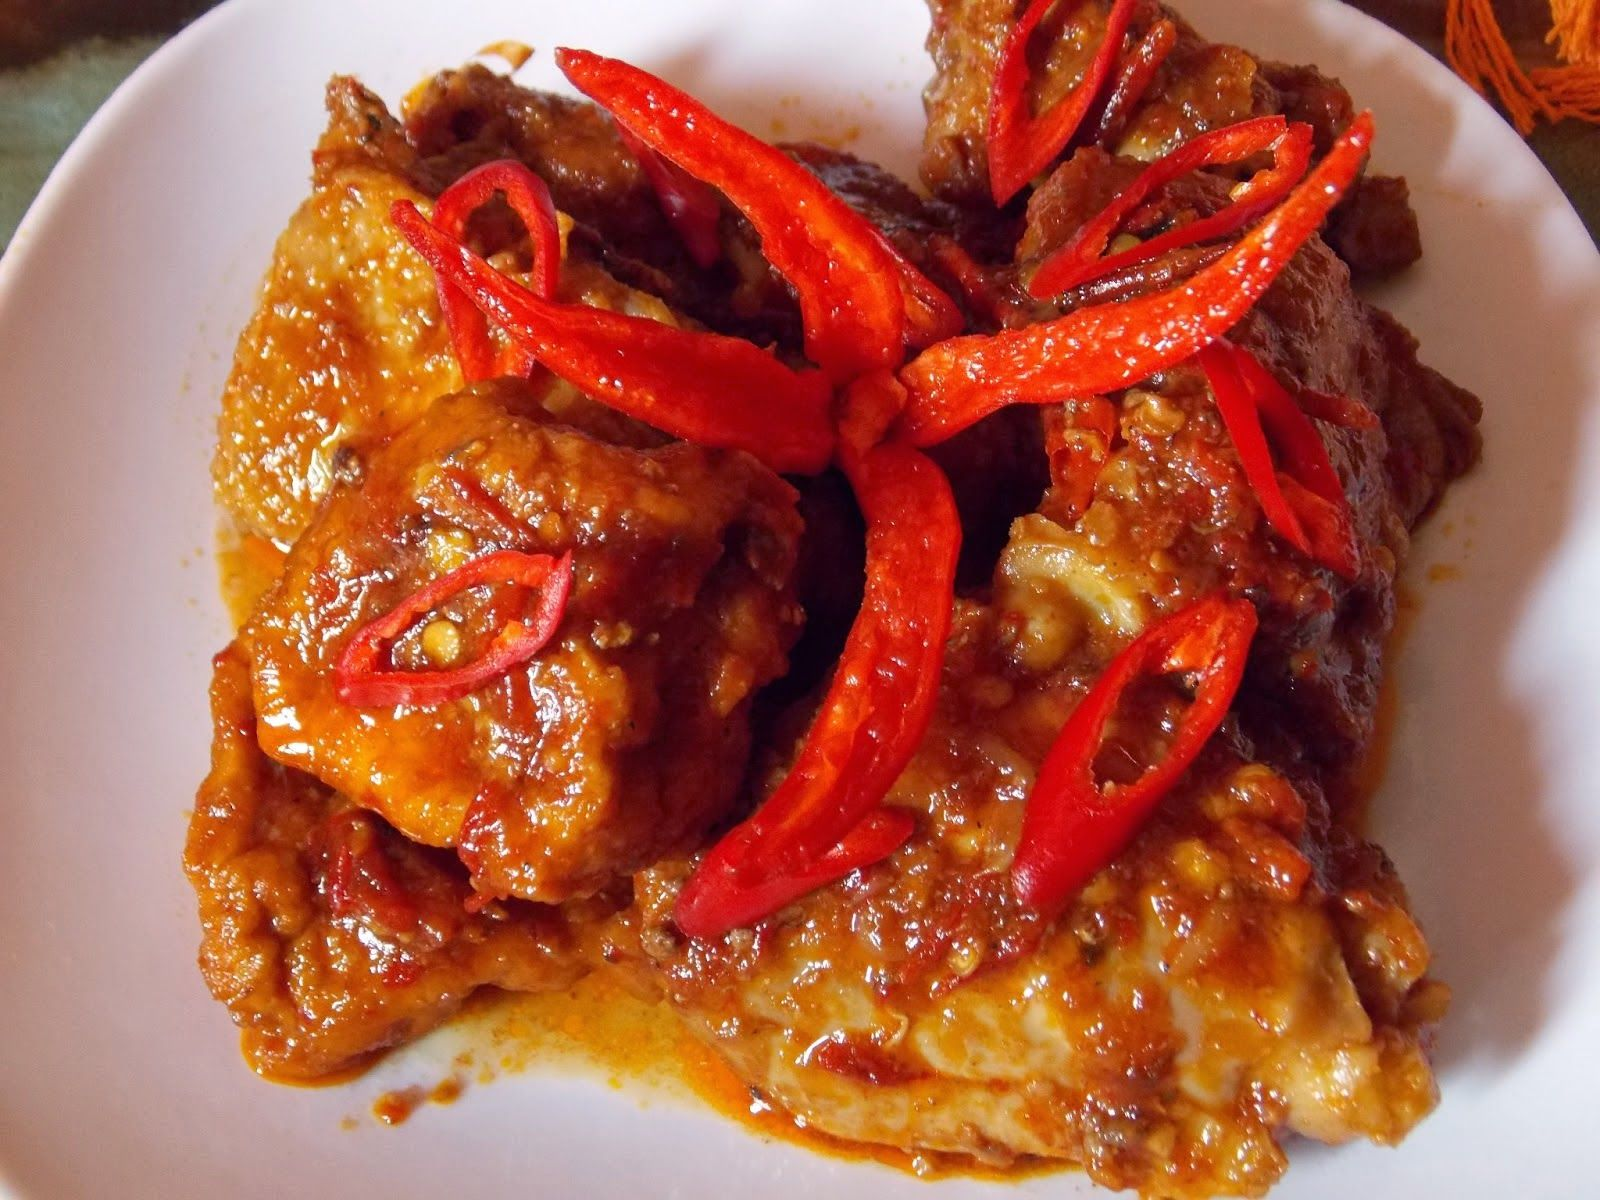 Aneka Resep Masakan Indonesia Resep Ayam Balado Resep Ayam Resep Masakan Resep